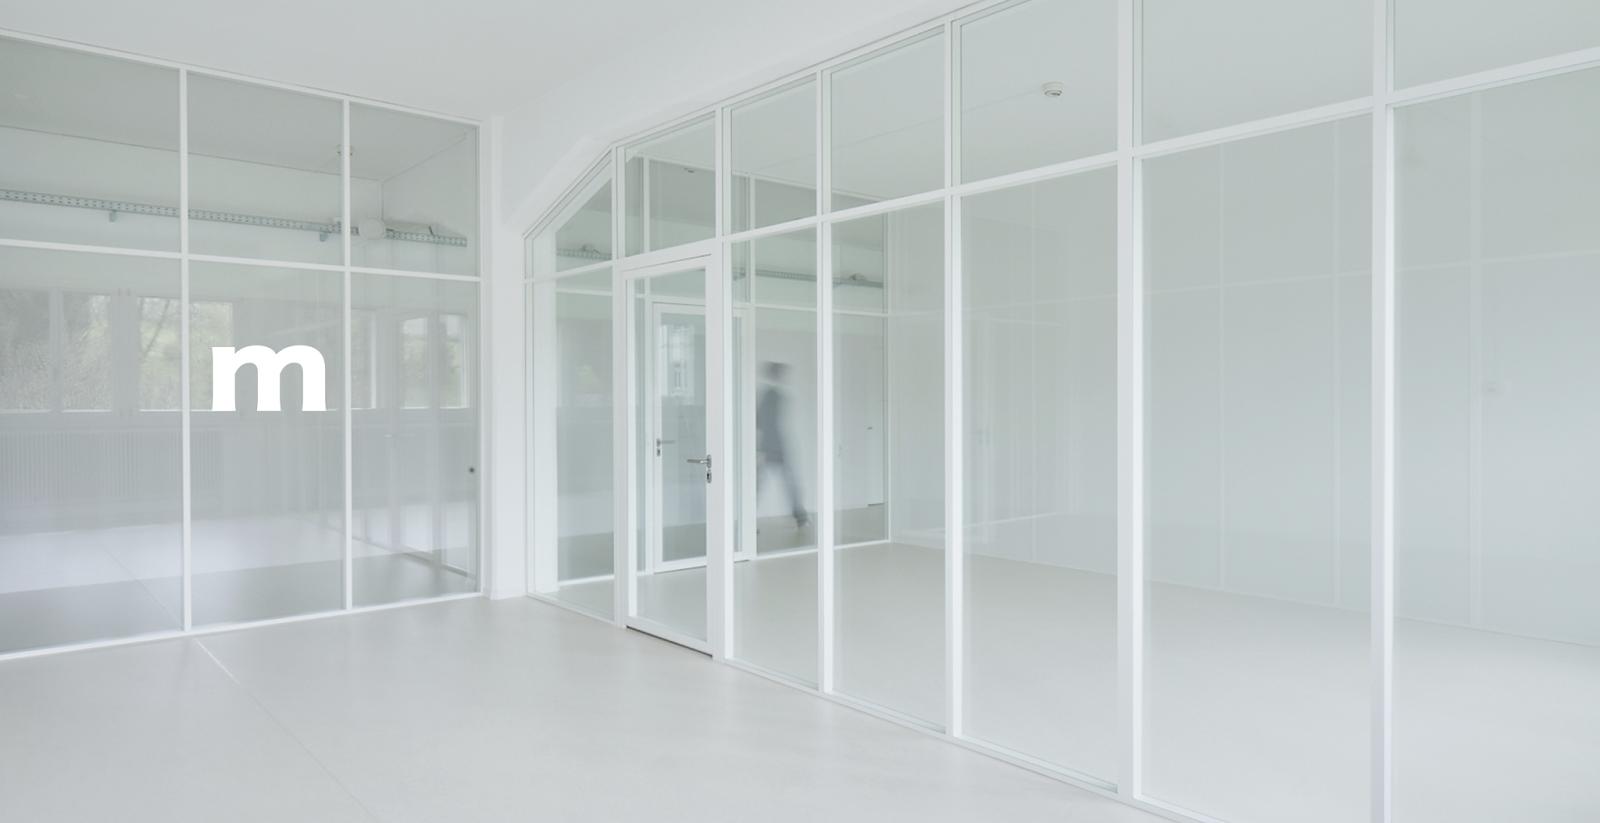 Baeb bureau d architecture emmanuel bouffioux architetti a